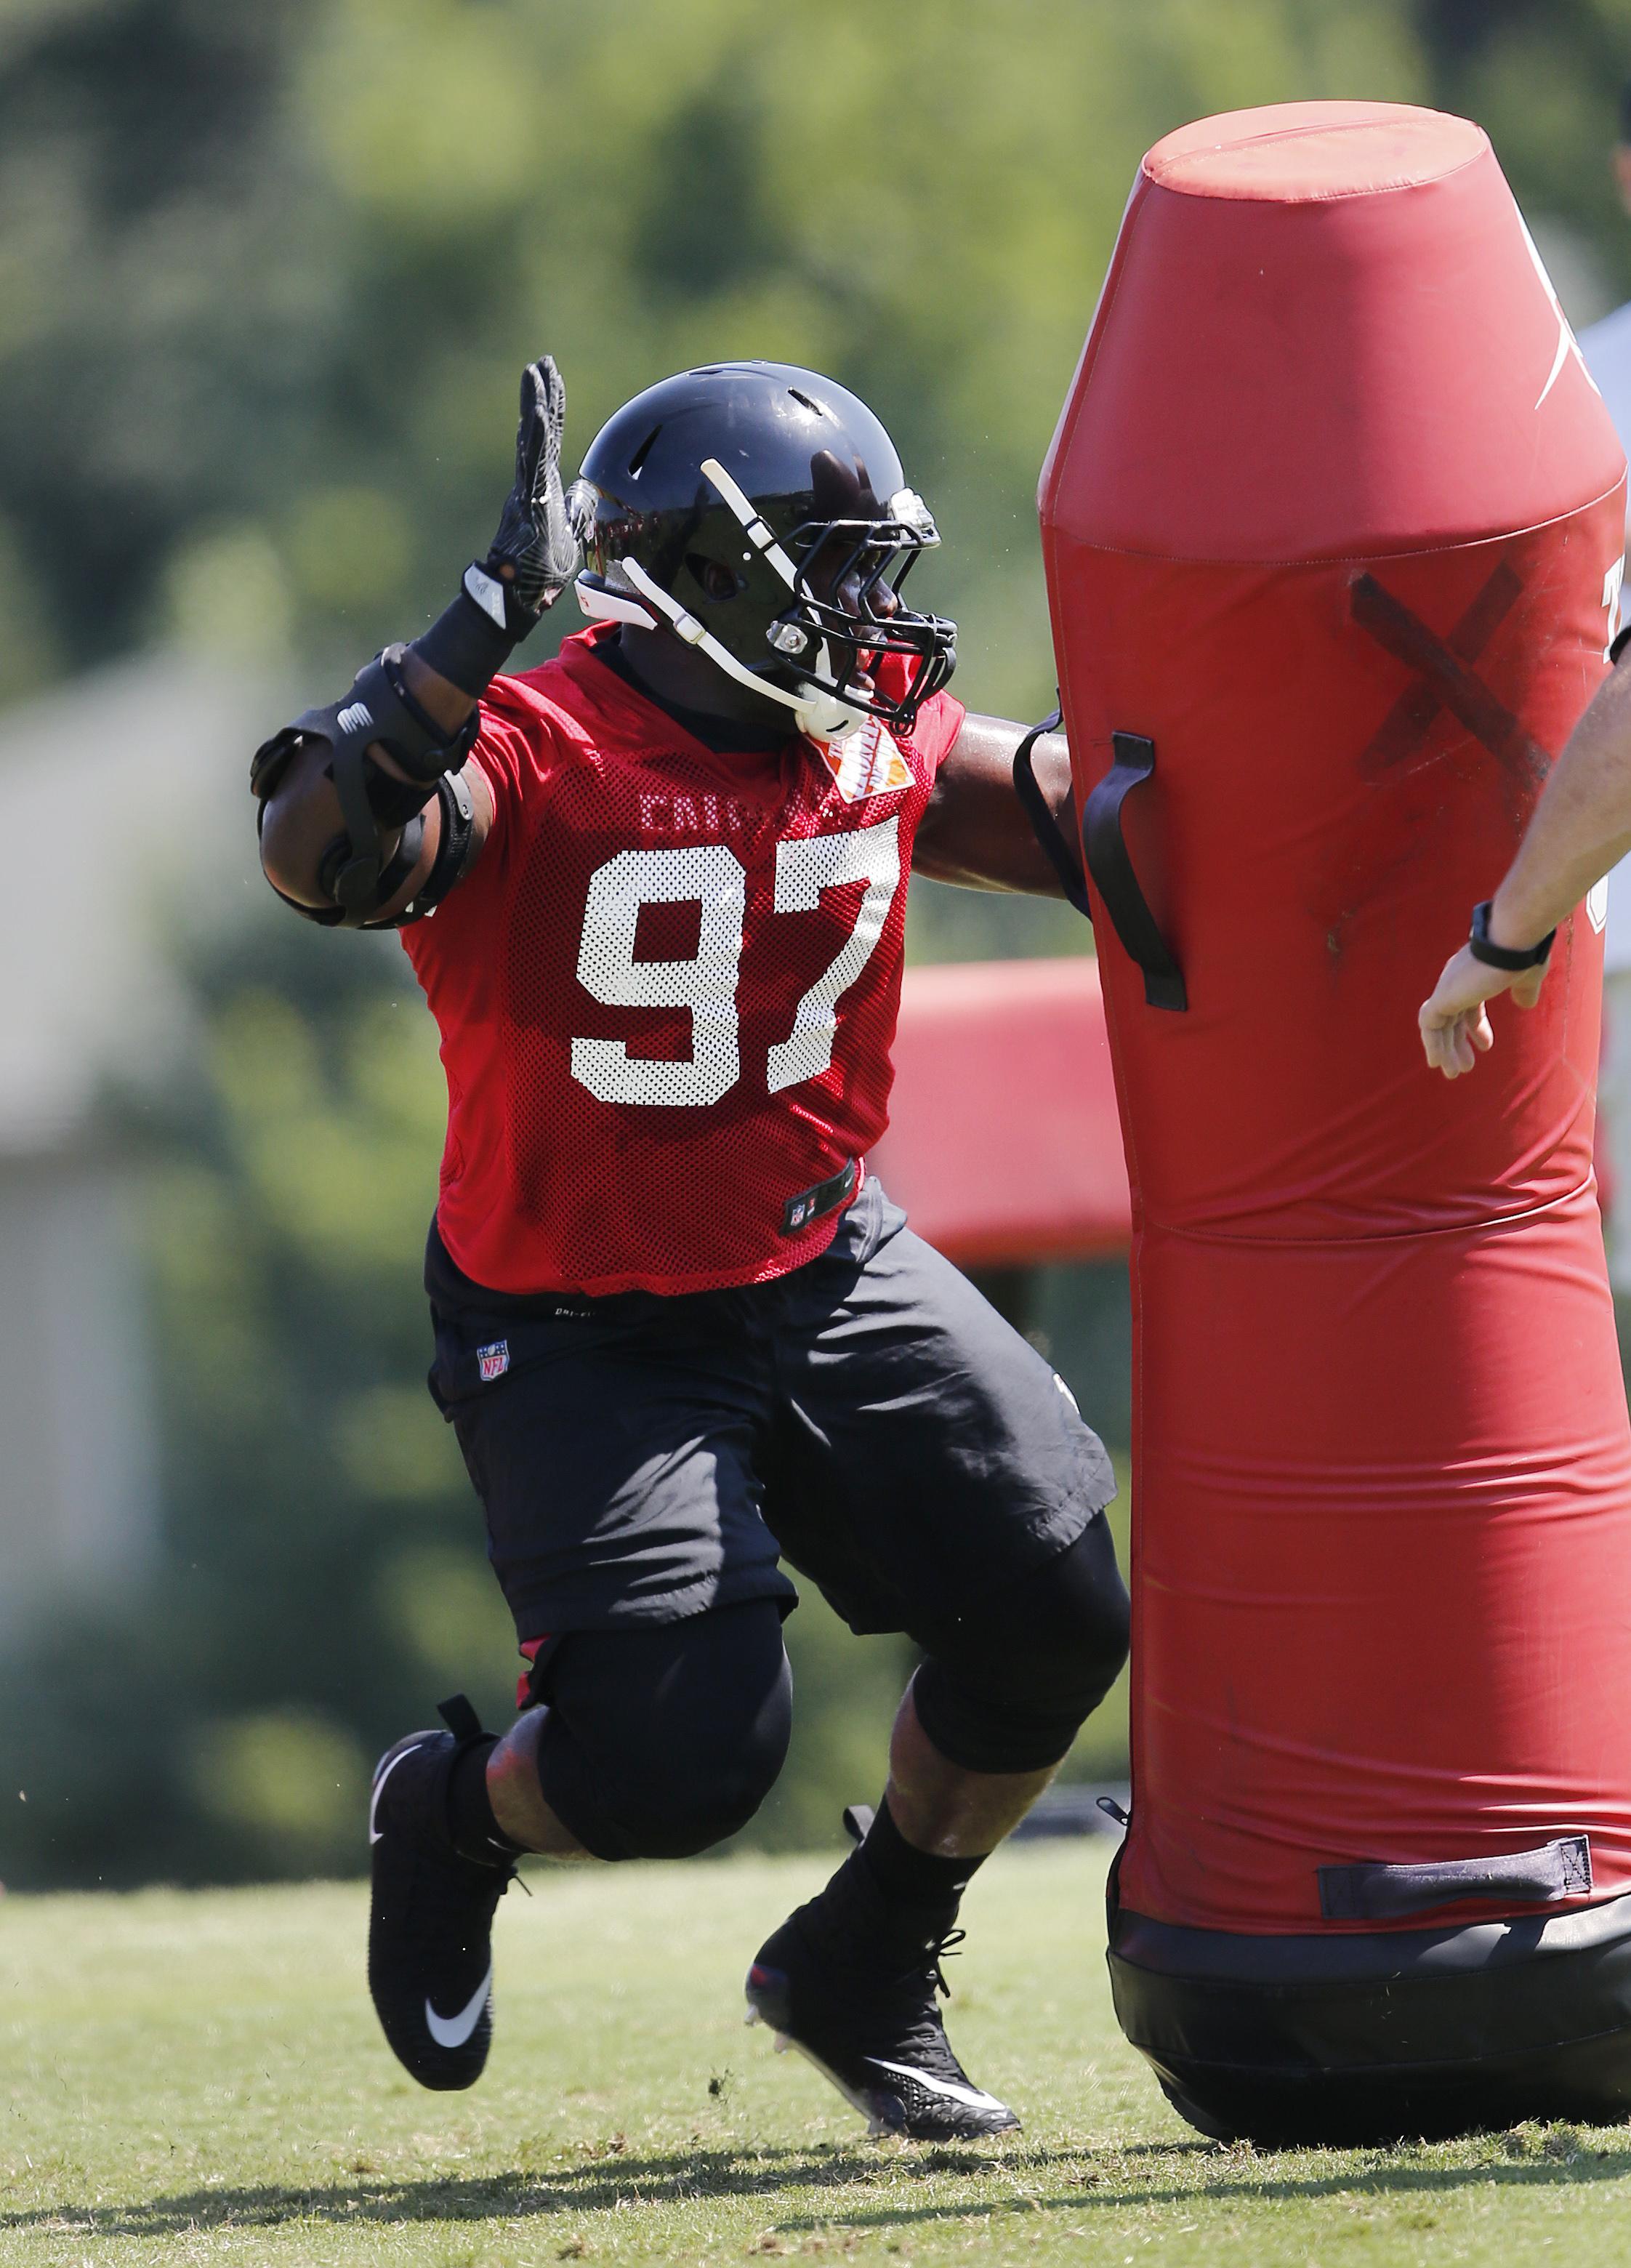 Falcons Grady Jarrett wants to build off 3 sacks in Super Bowl